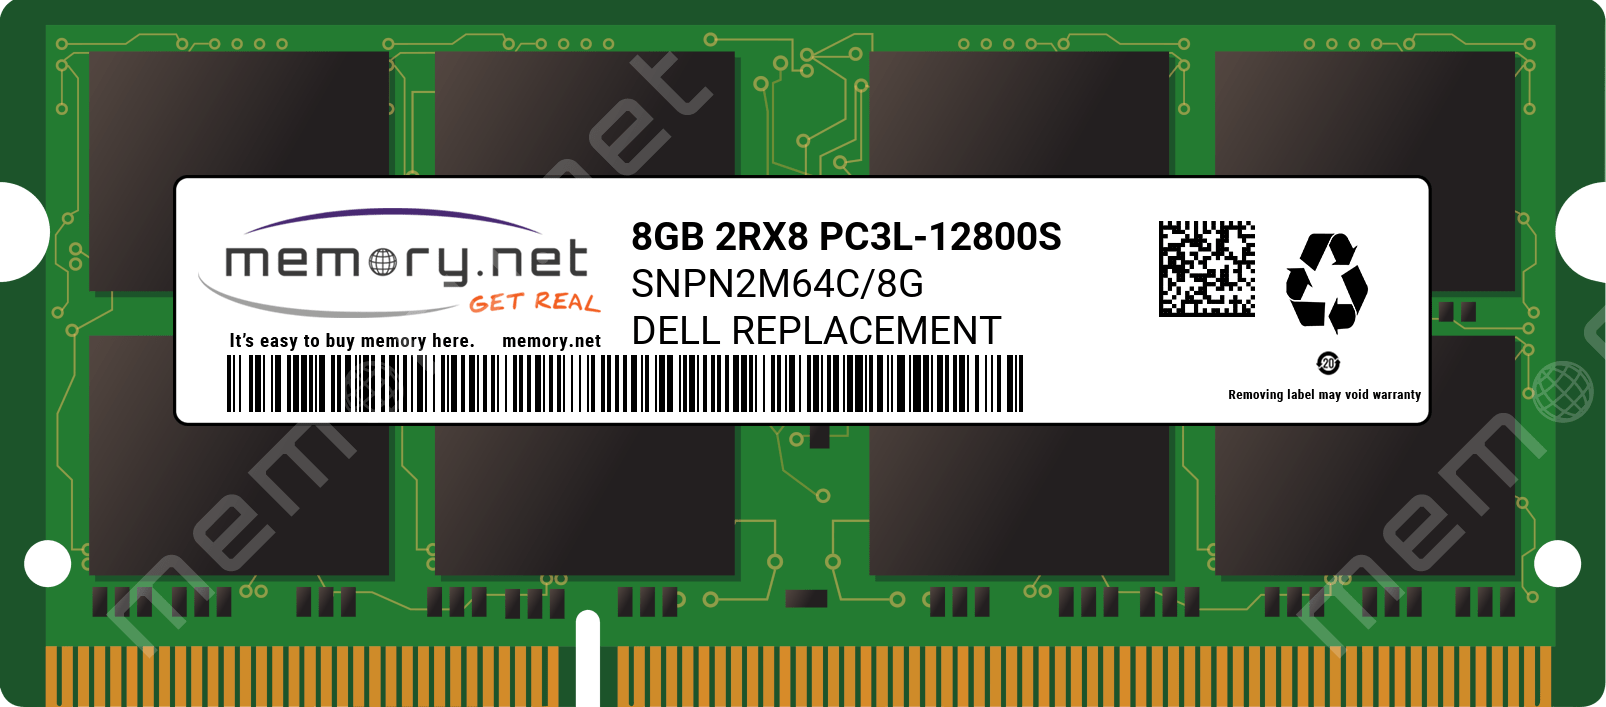 SNPN2M64C/8G